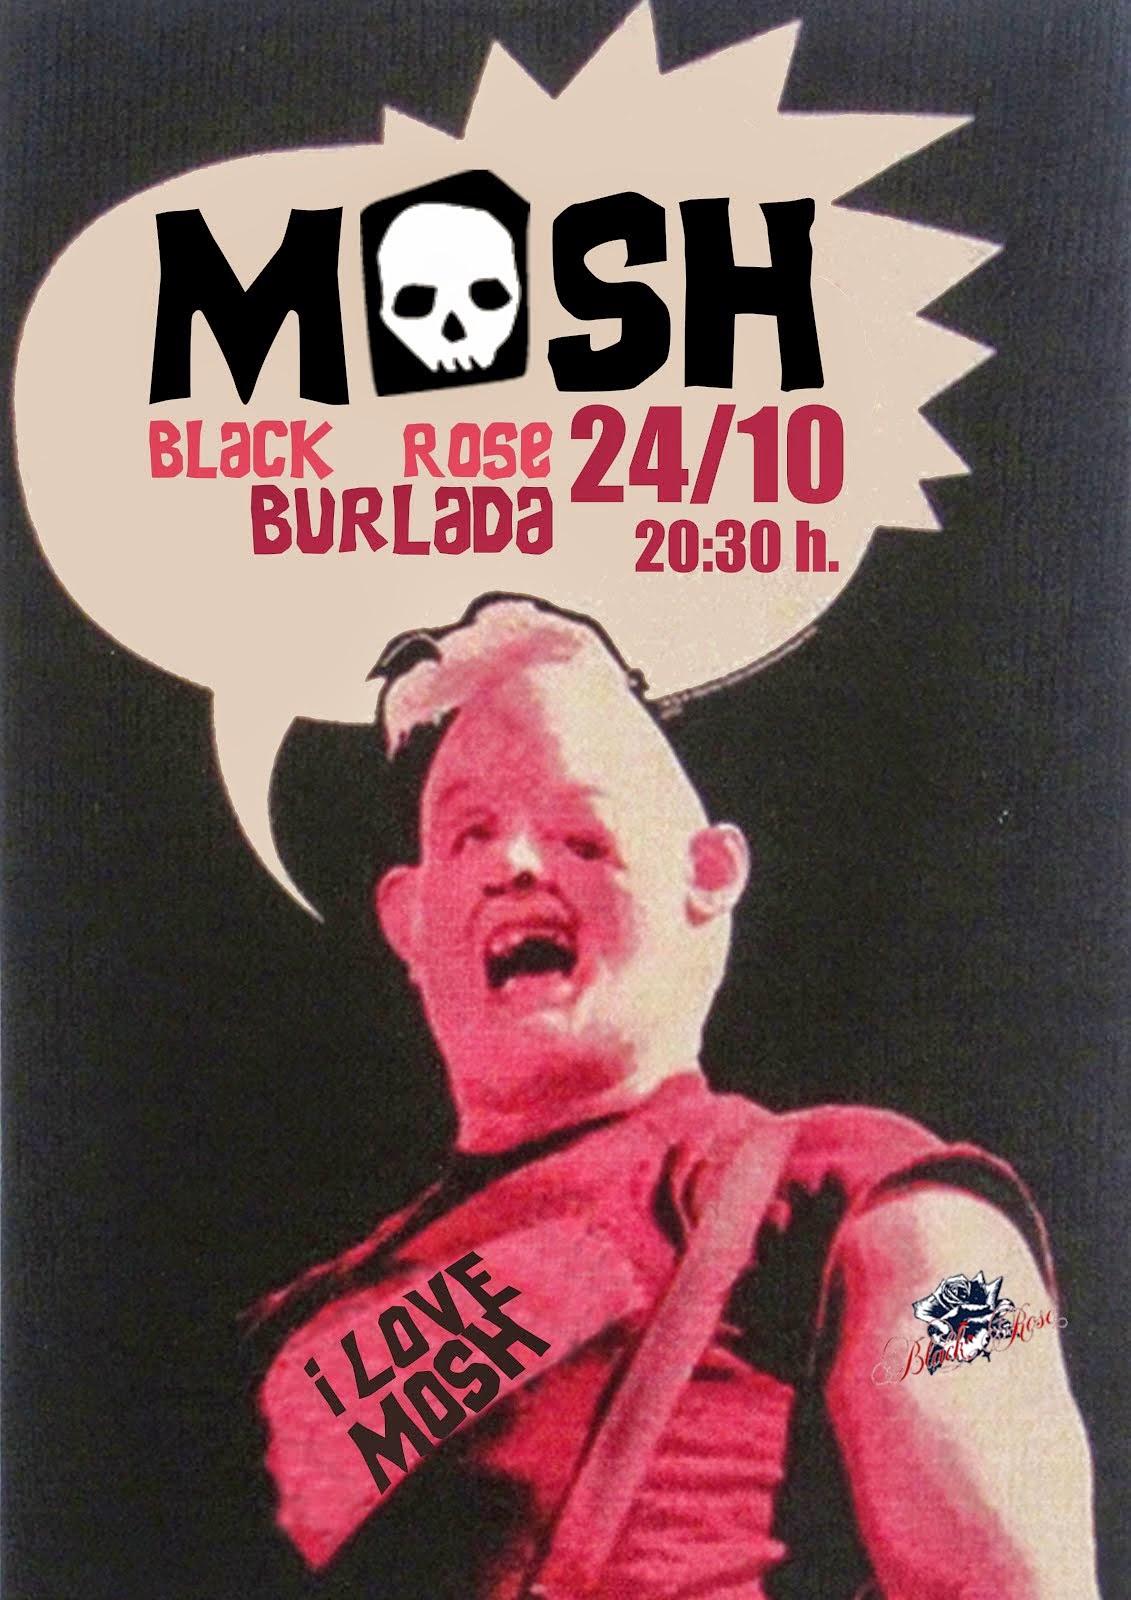 MOSH, VIERNES 24 EN BLACK ROSE